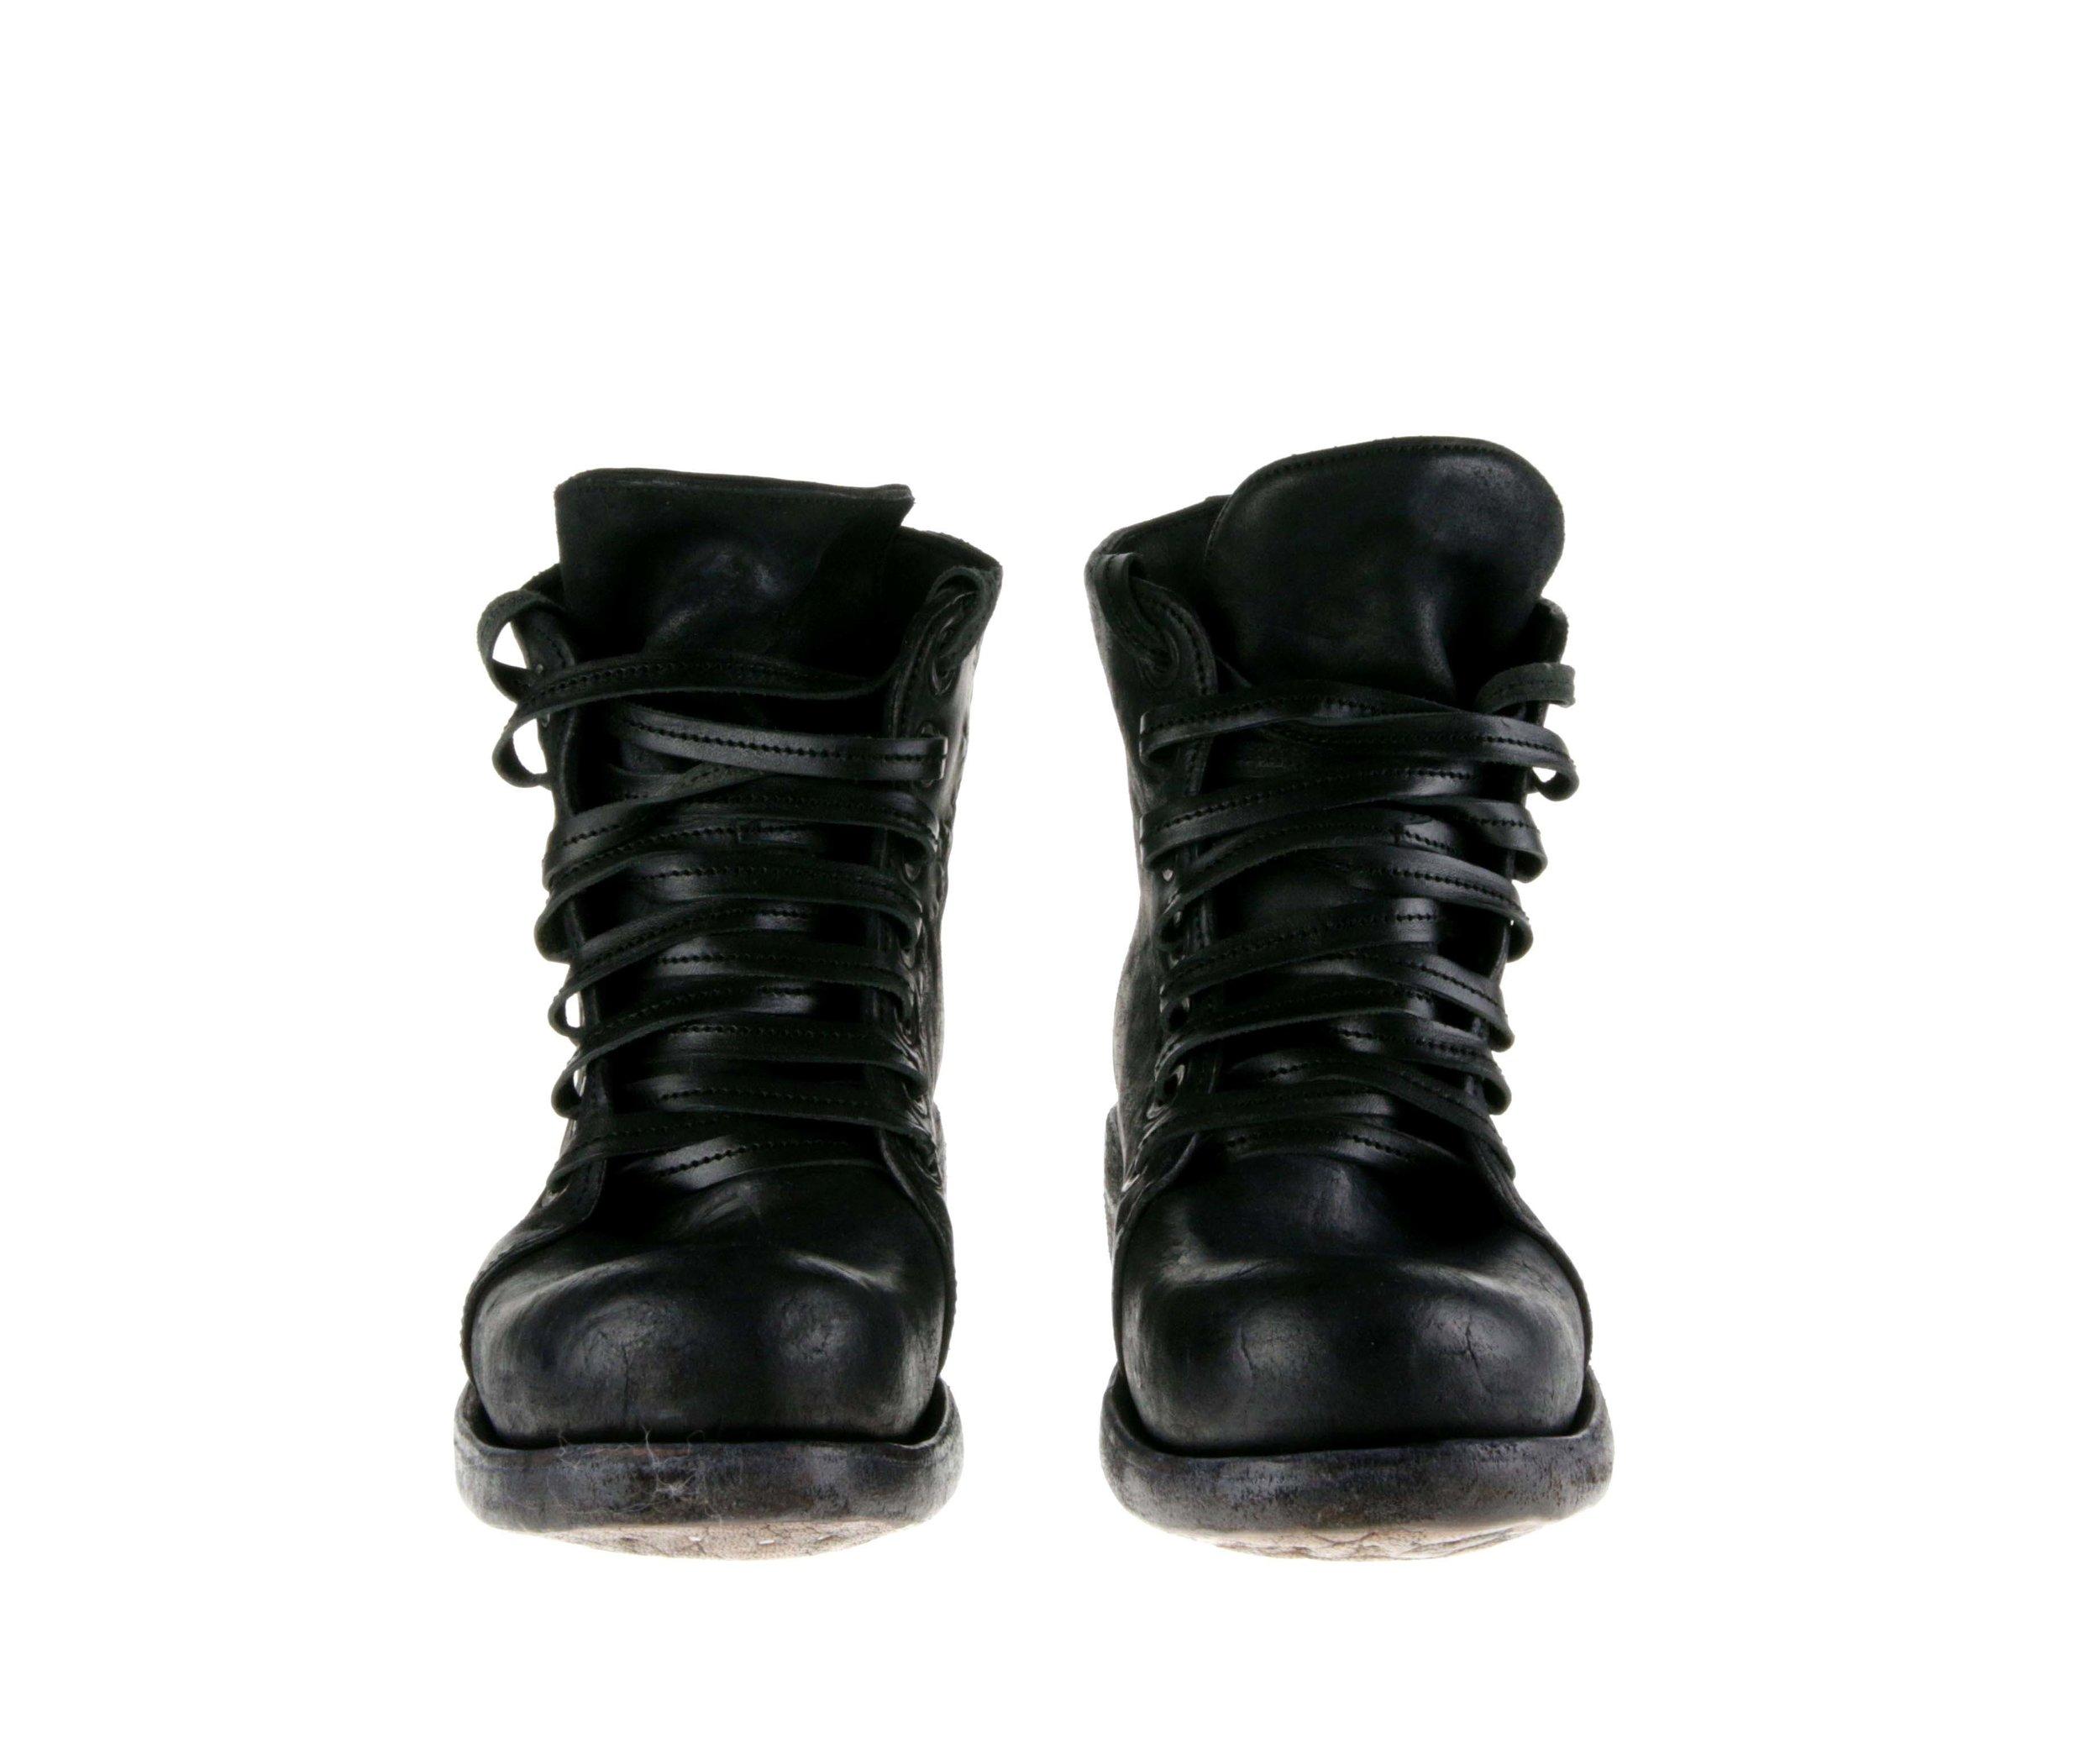 7Hole Boot Black Culatta Double Front.jpg